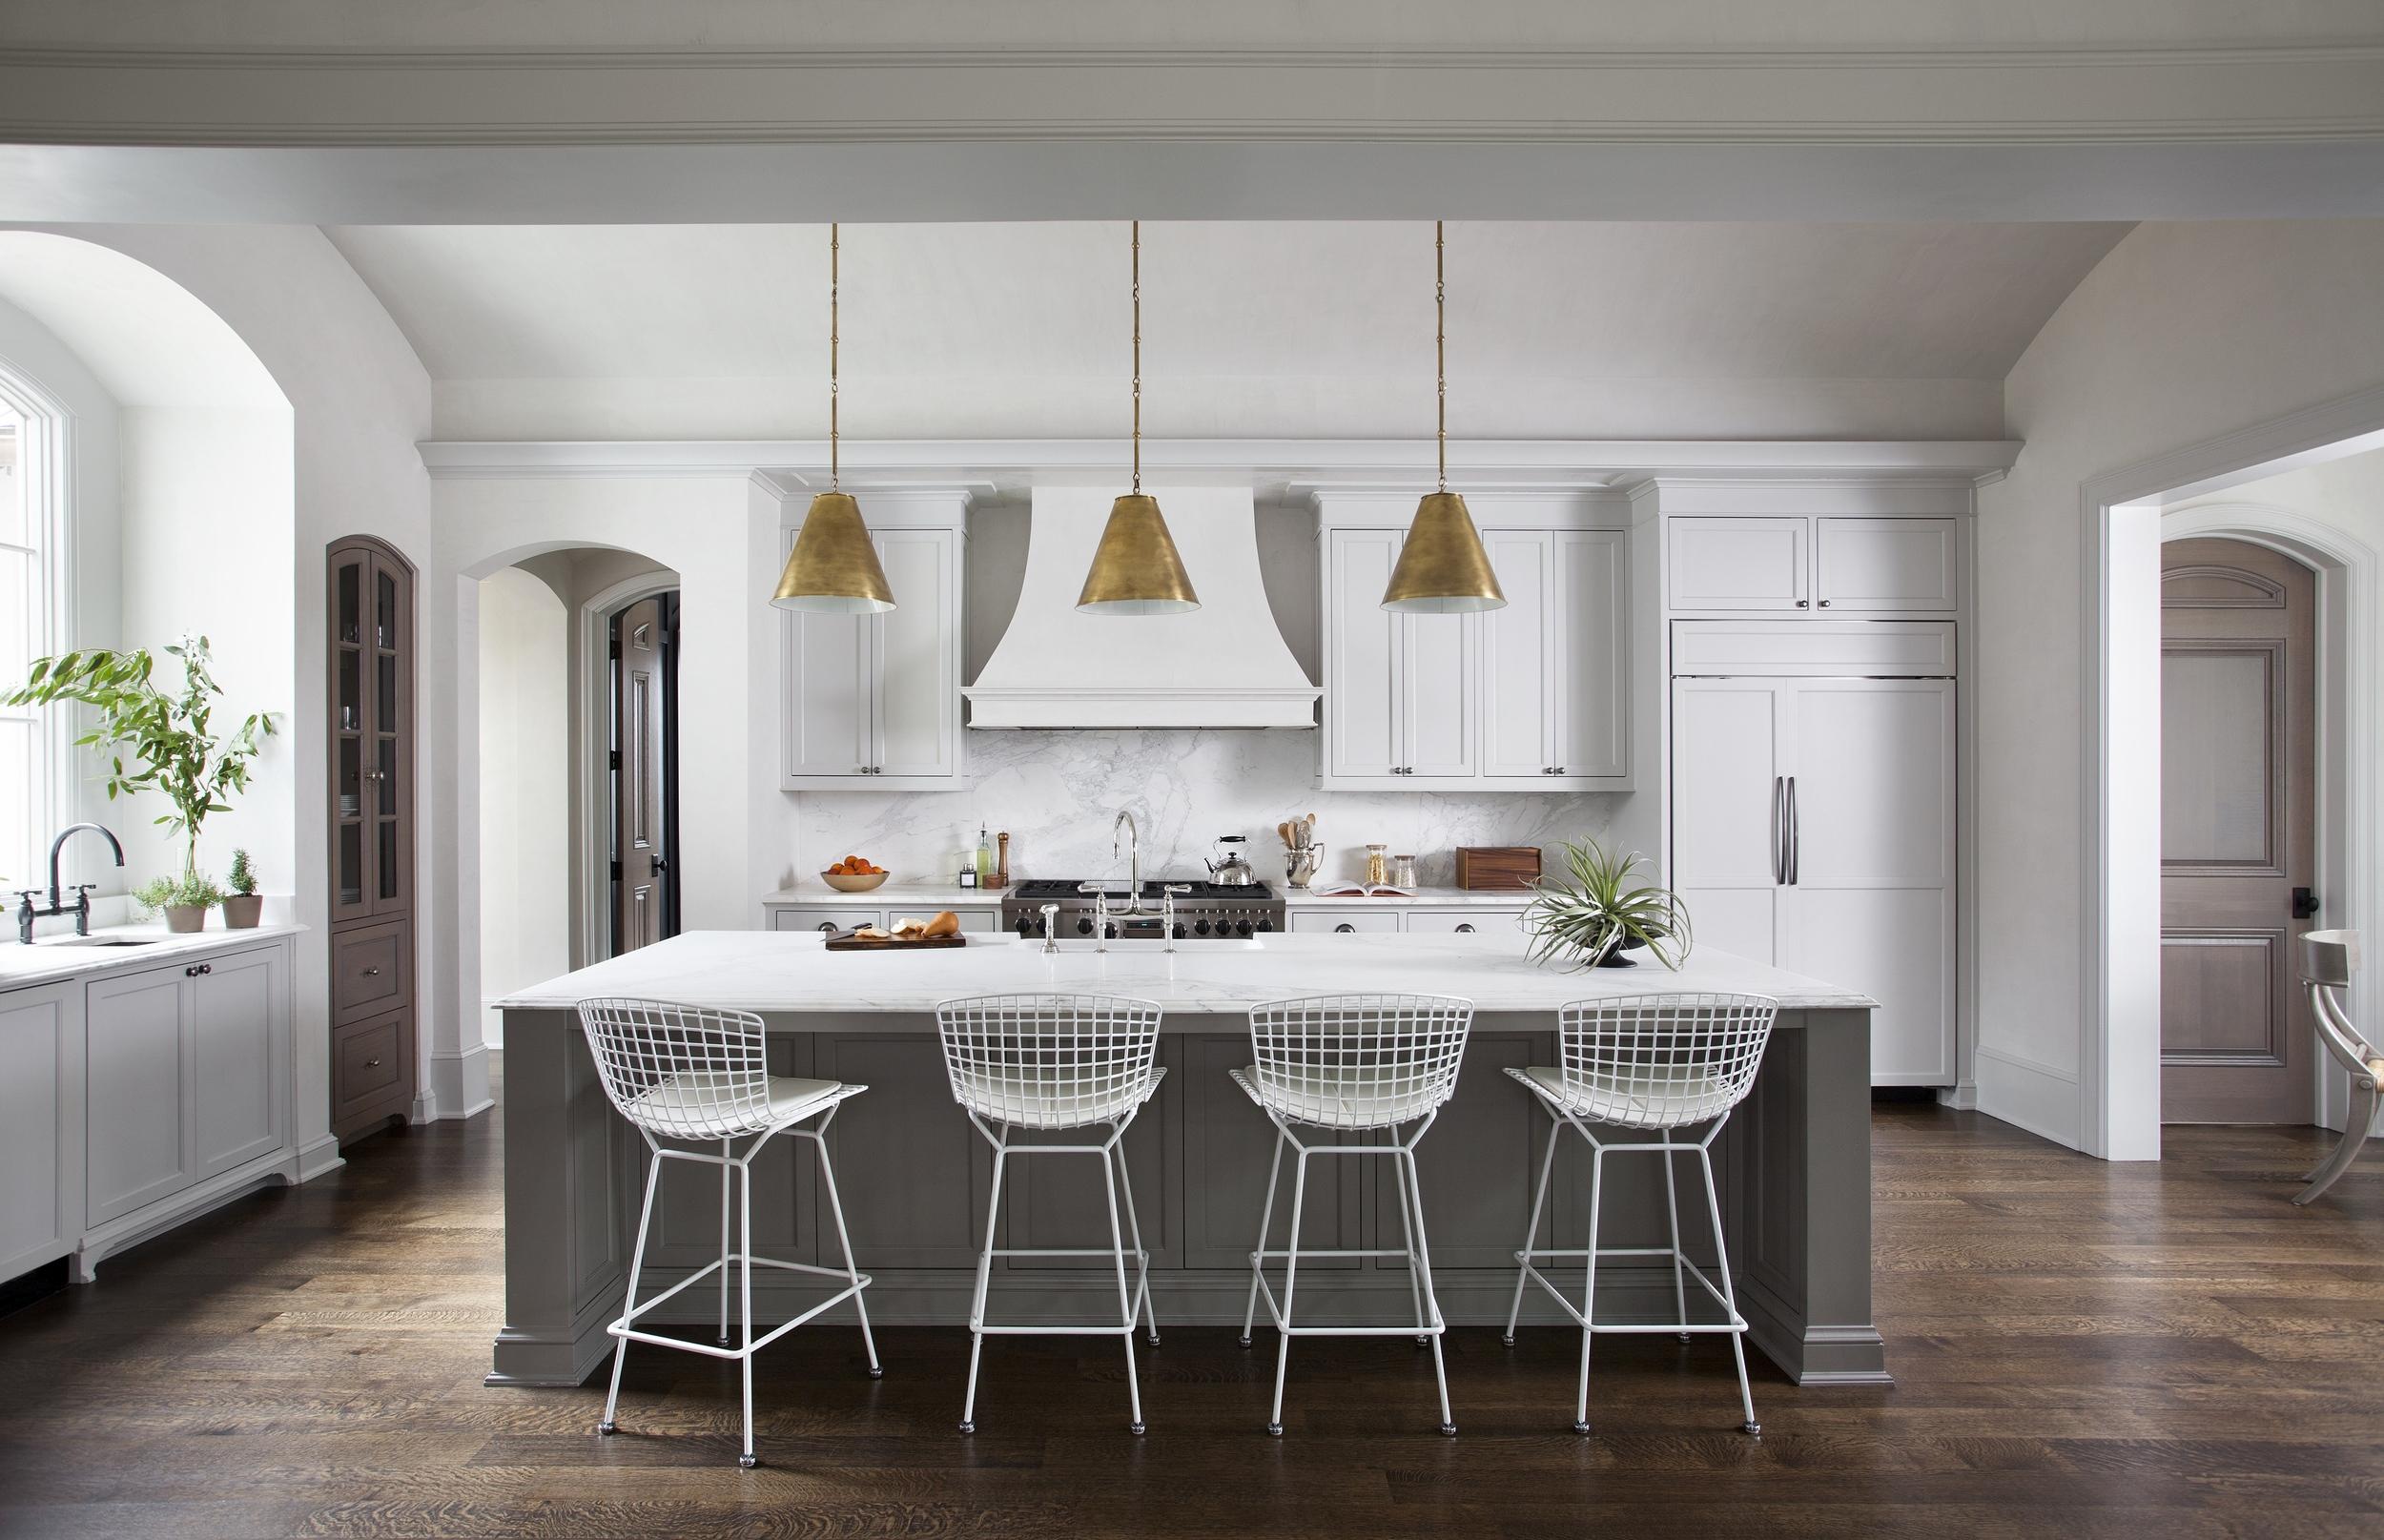 Studio Seiders | Meredith | Kitchen